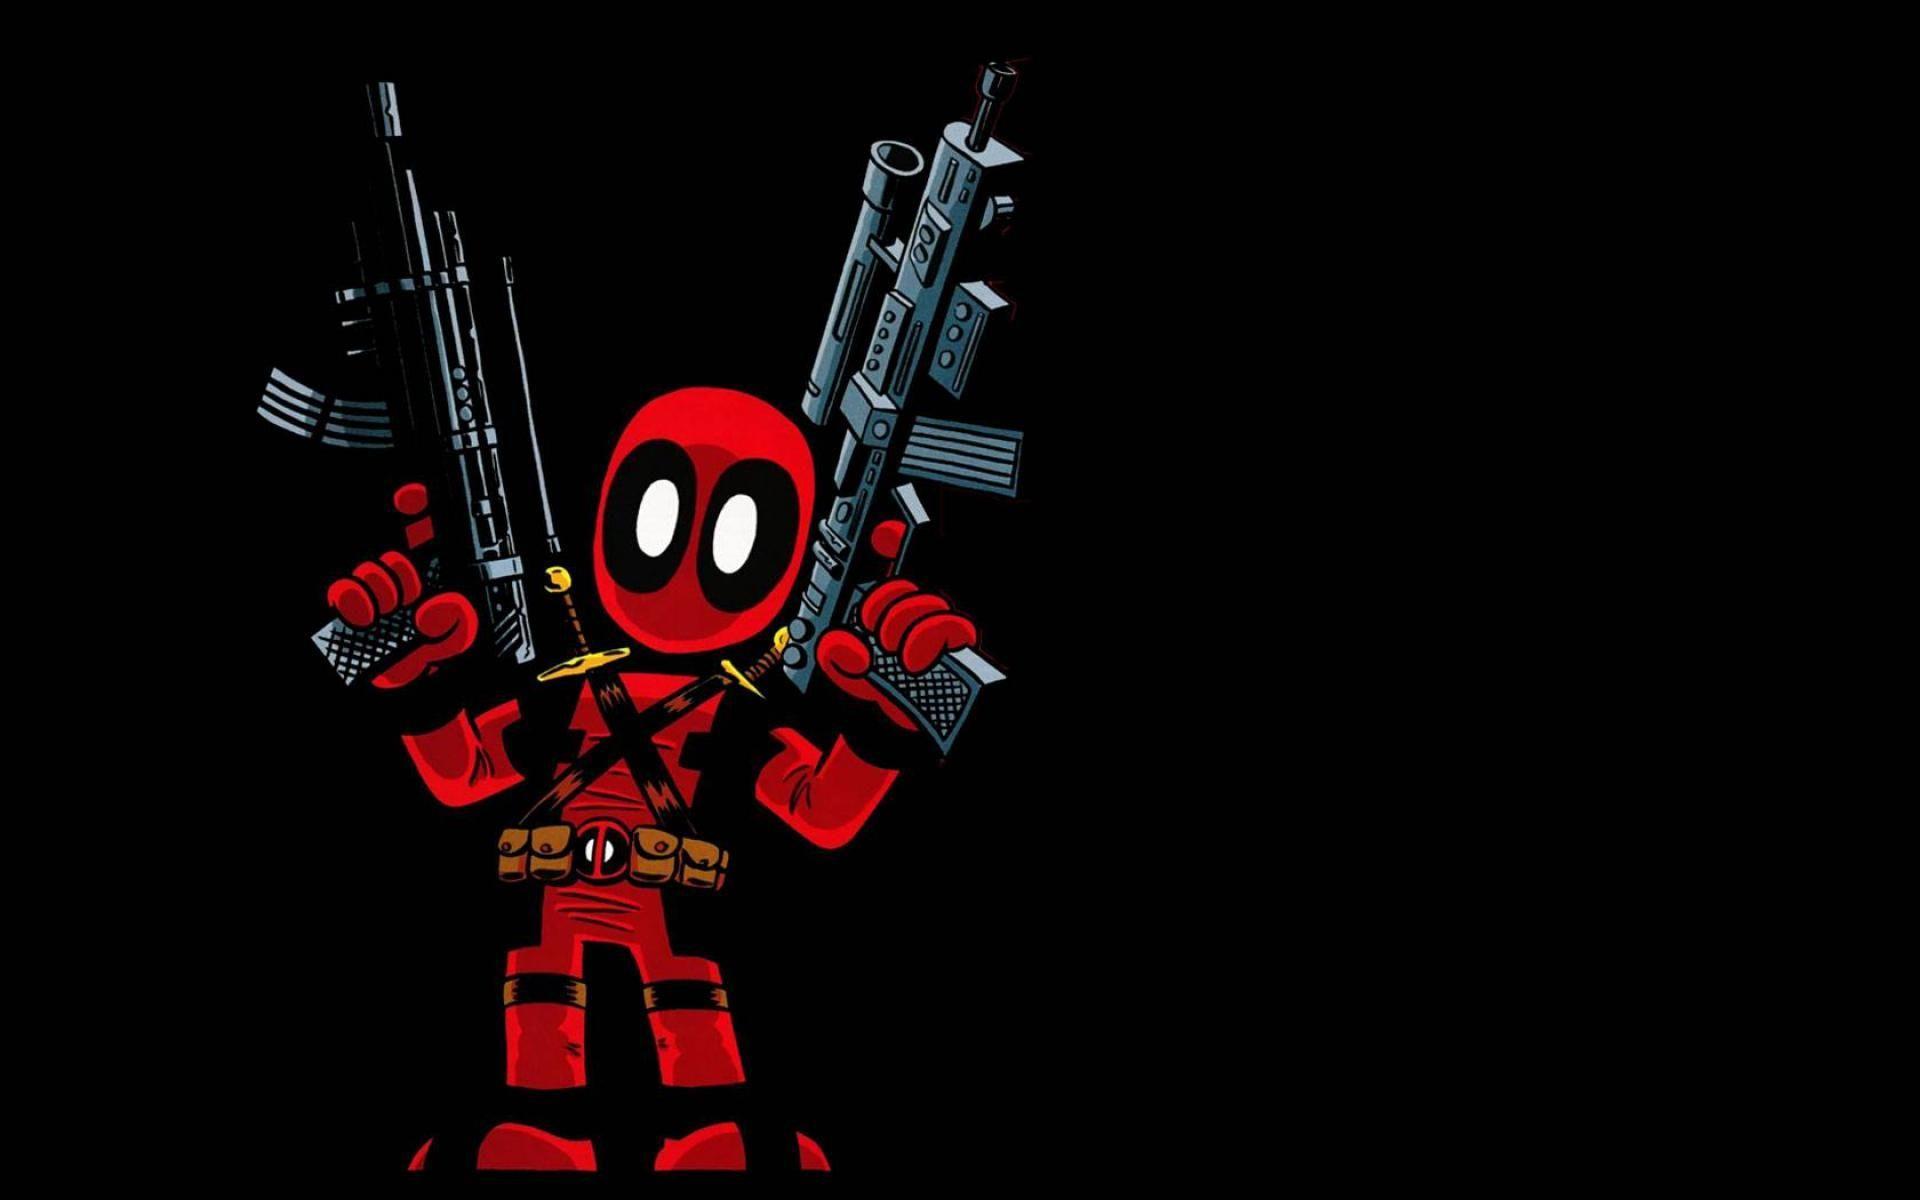 Funny Deadpool Desktop Wallpapers Top Free Funny Deadpool Desktop Backgrounds Wallpaperaccess